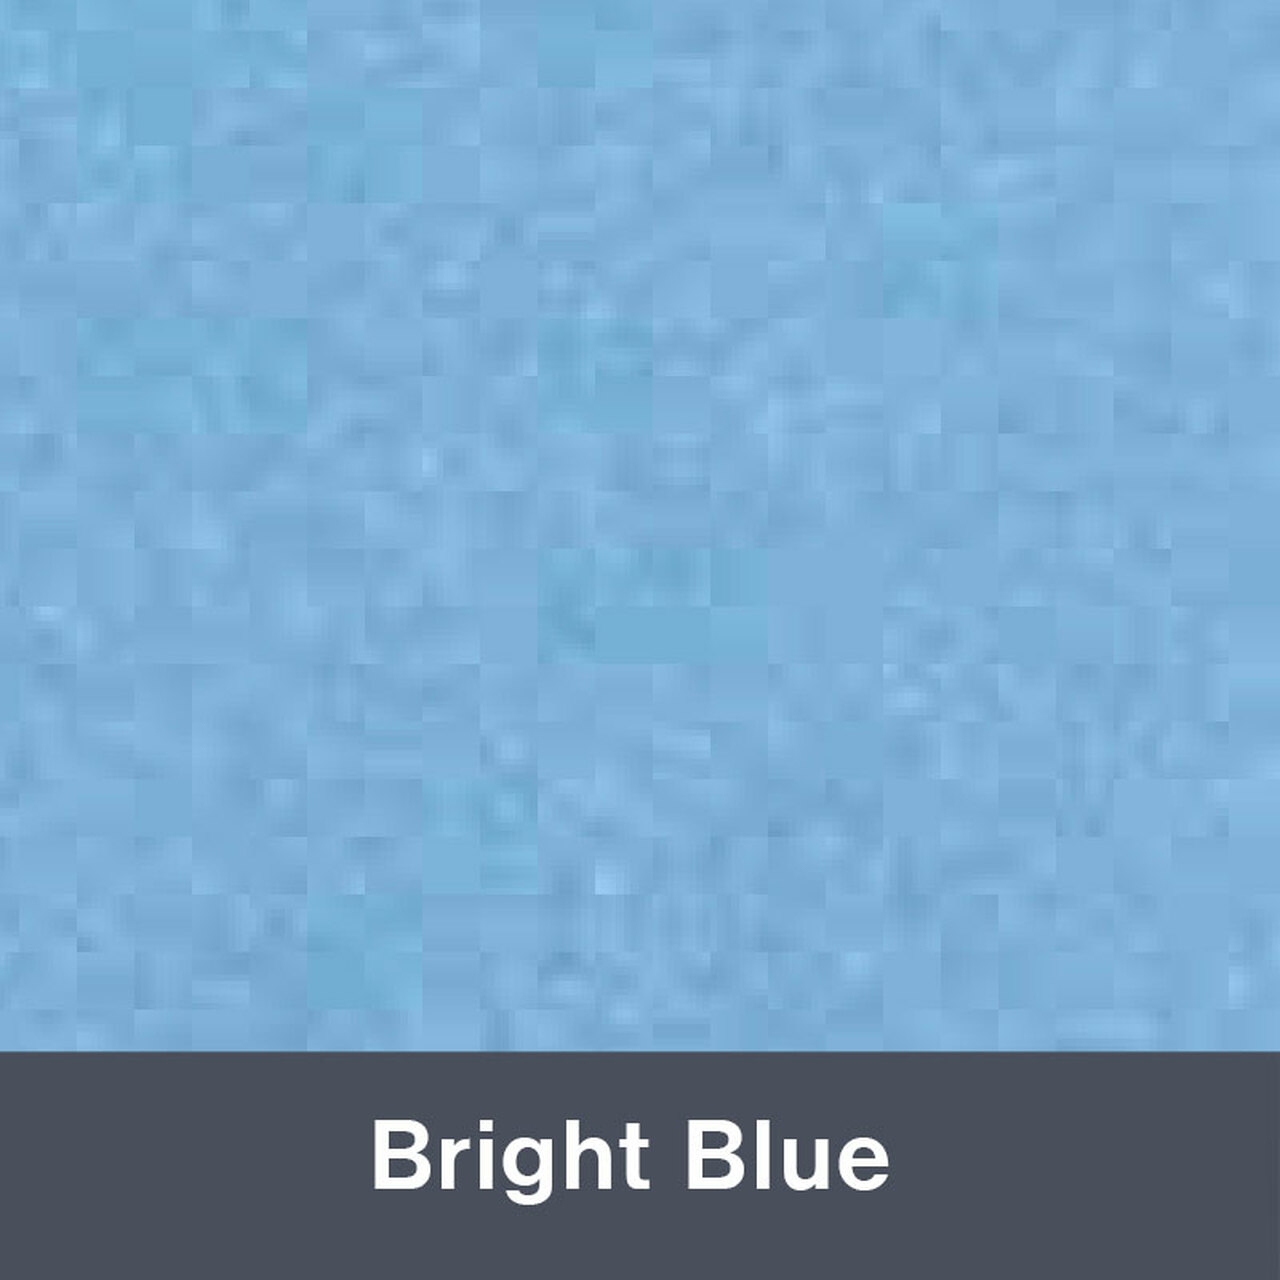 Iron-on Bright Blue Turbo 4927